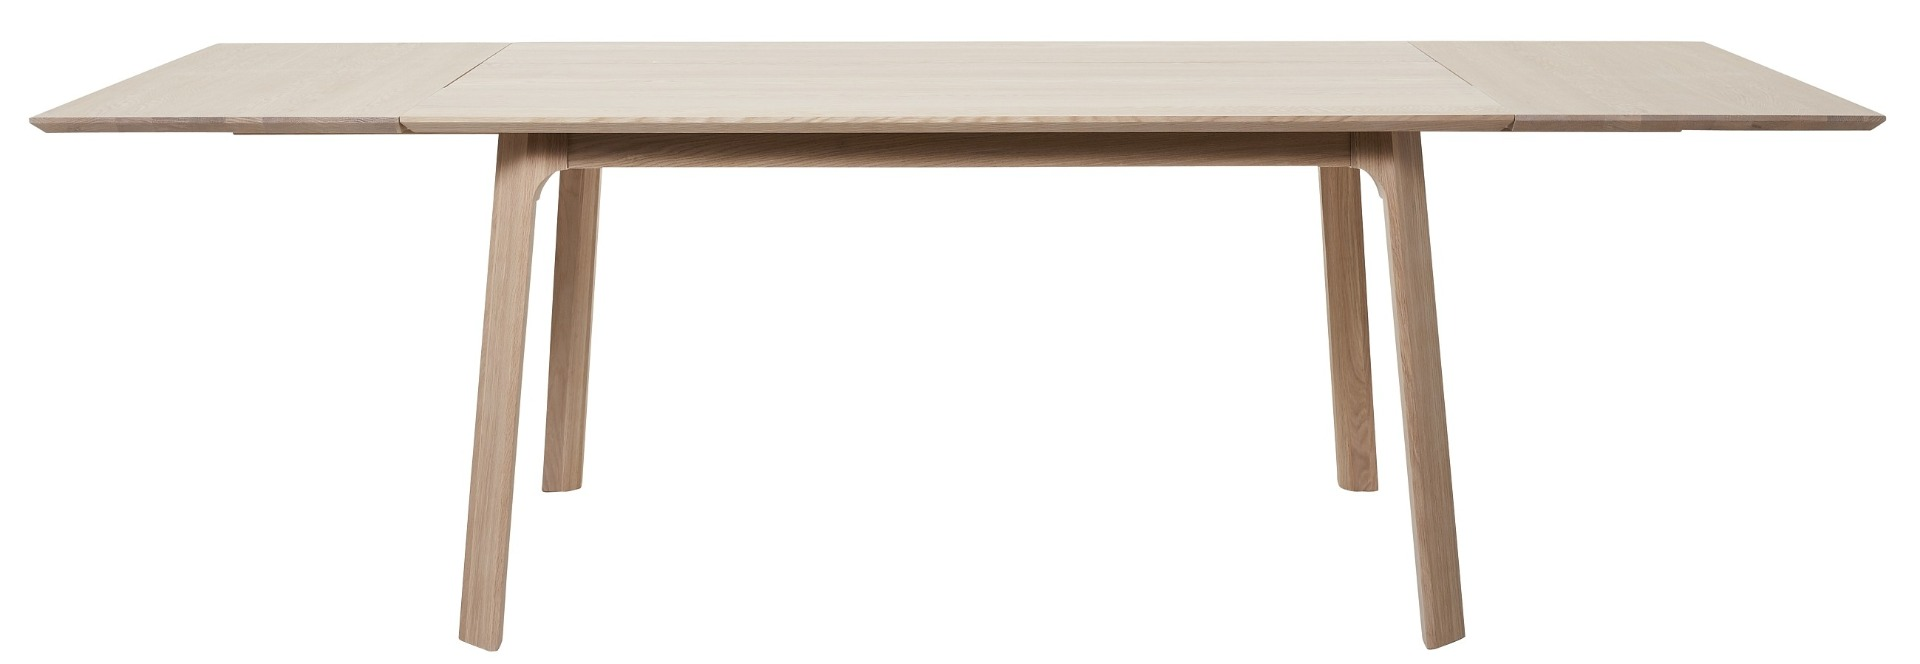 24Designs Haslund Verlengbare Eettafel - 150/250x95x75 - Eiken + 2 Aanlegbladen